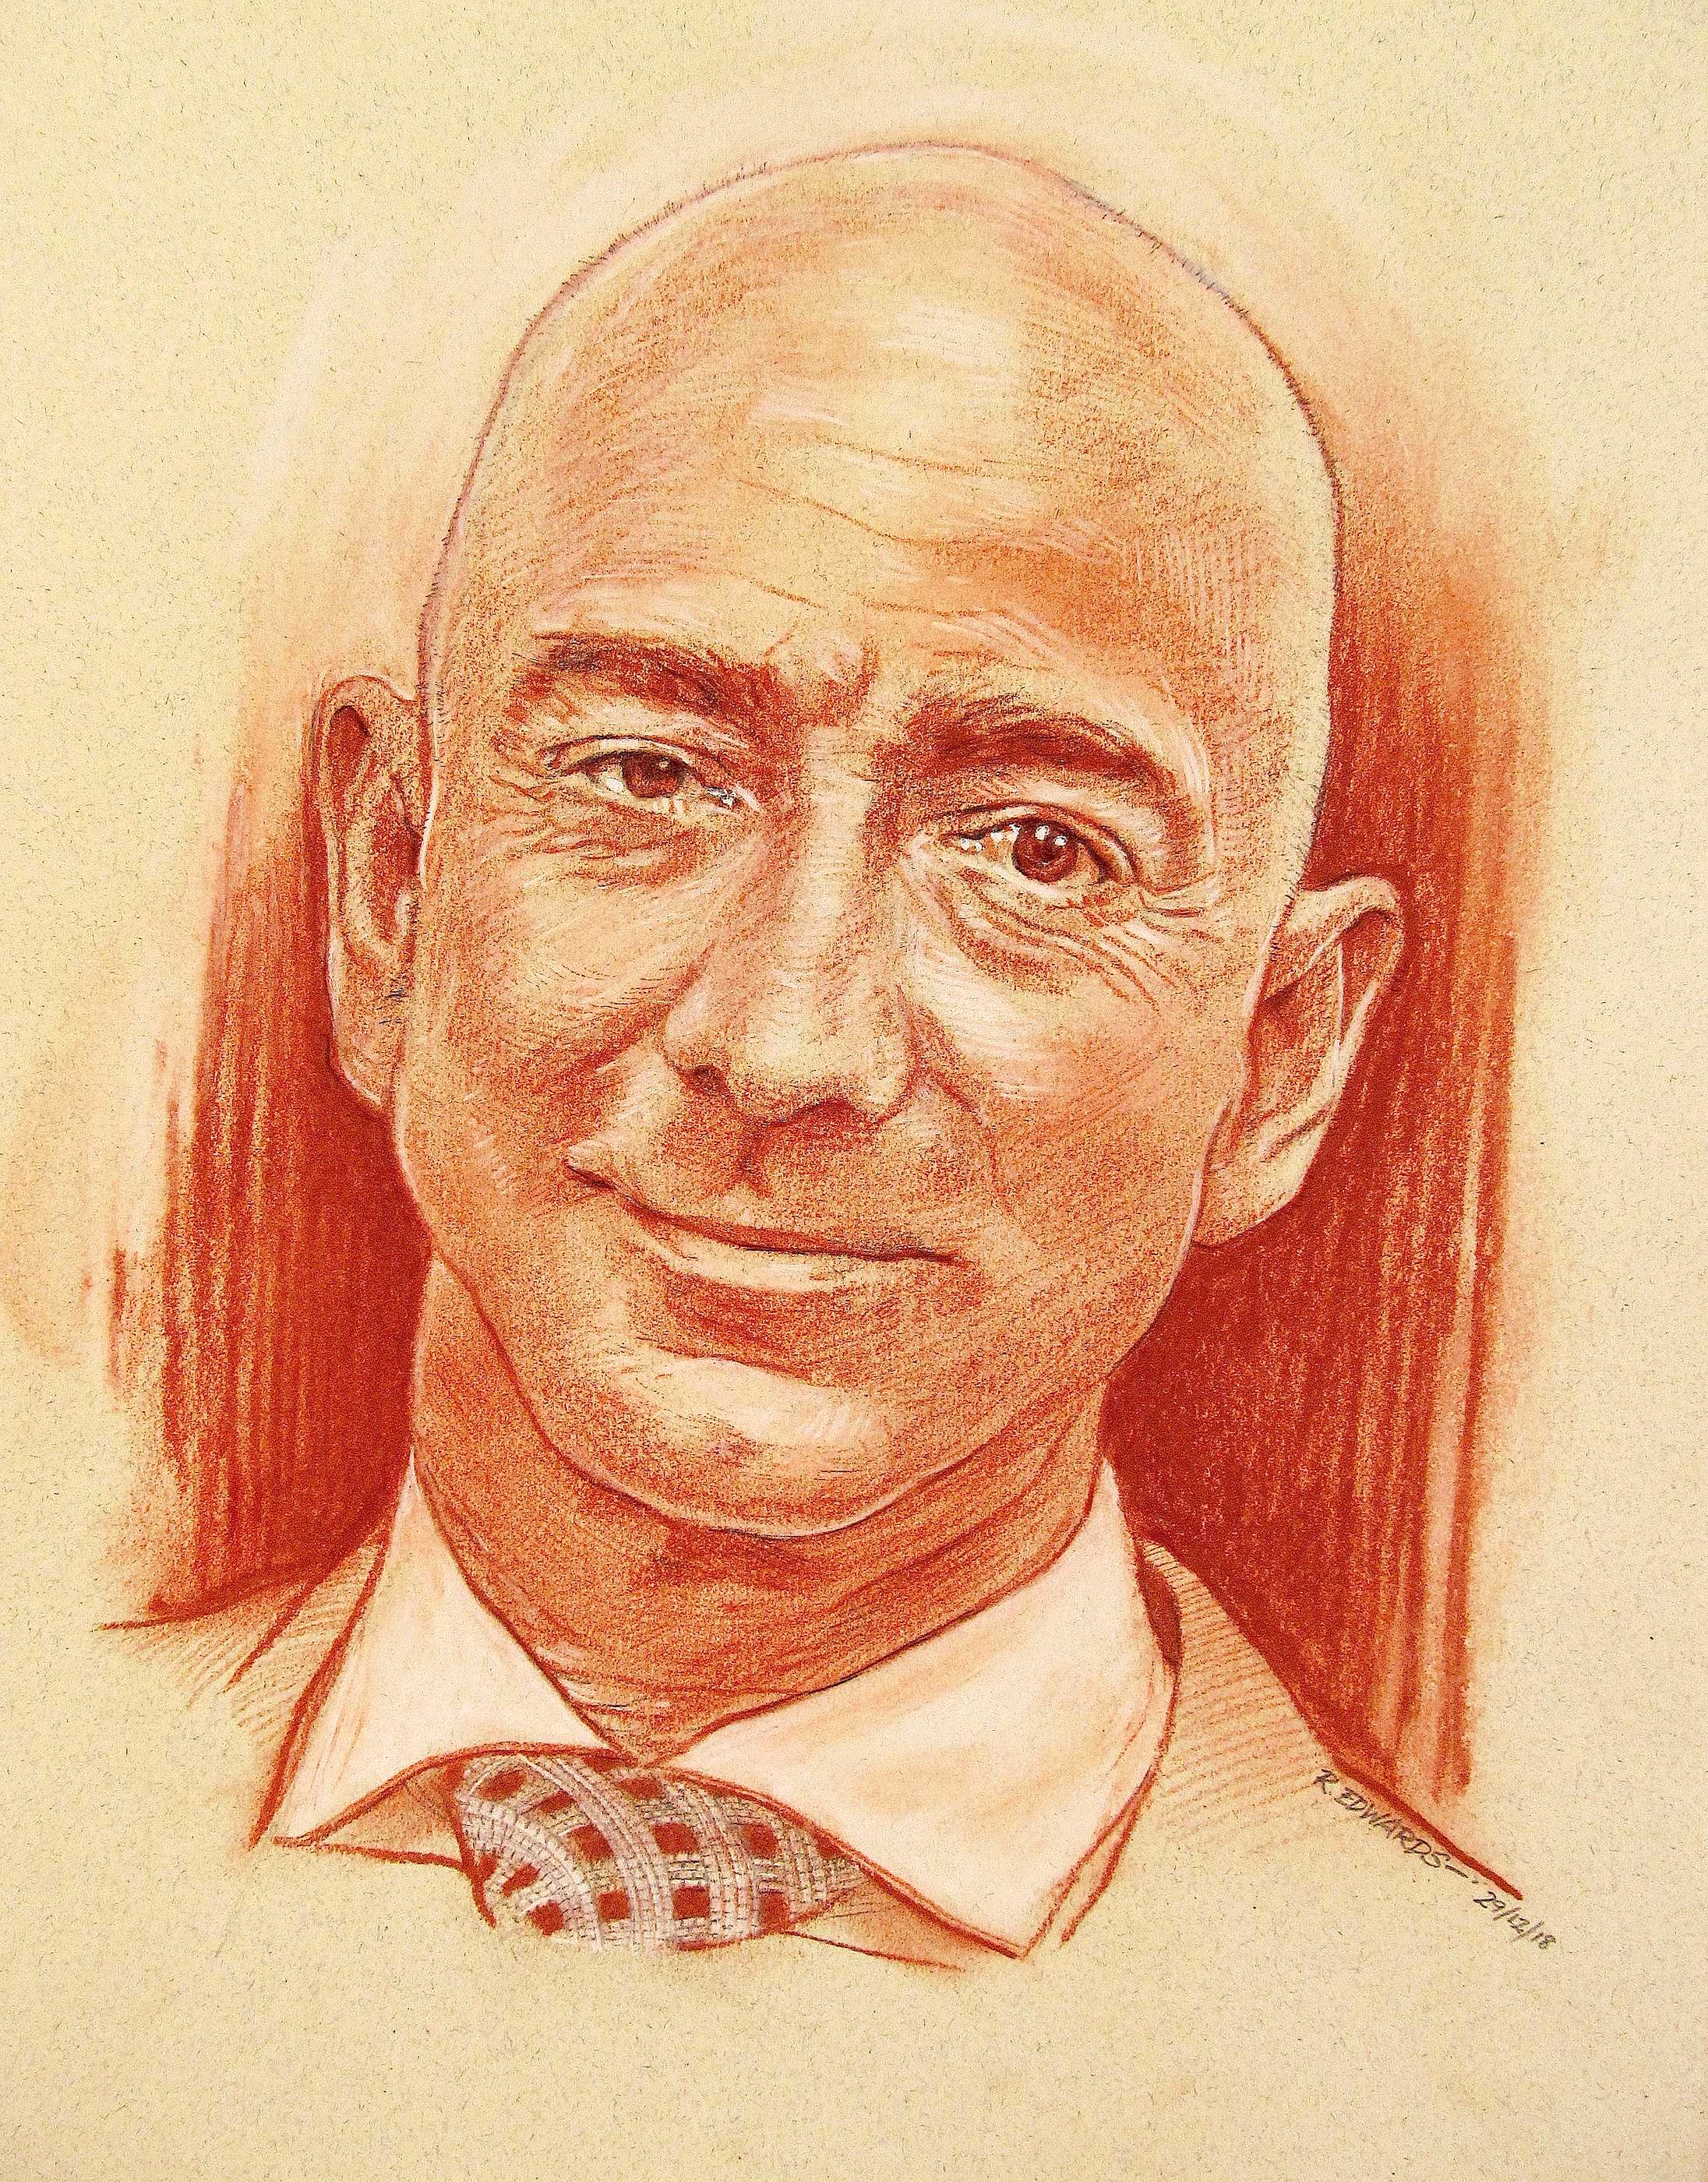 Jeff P. Bezos